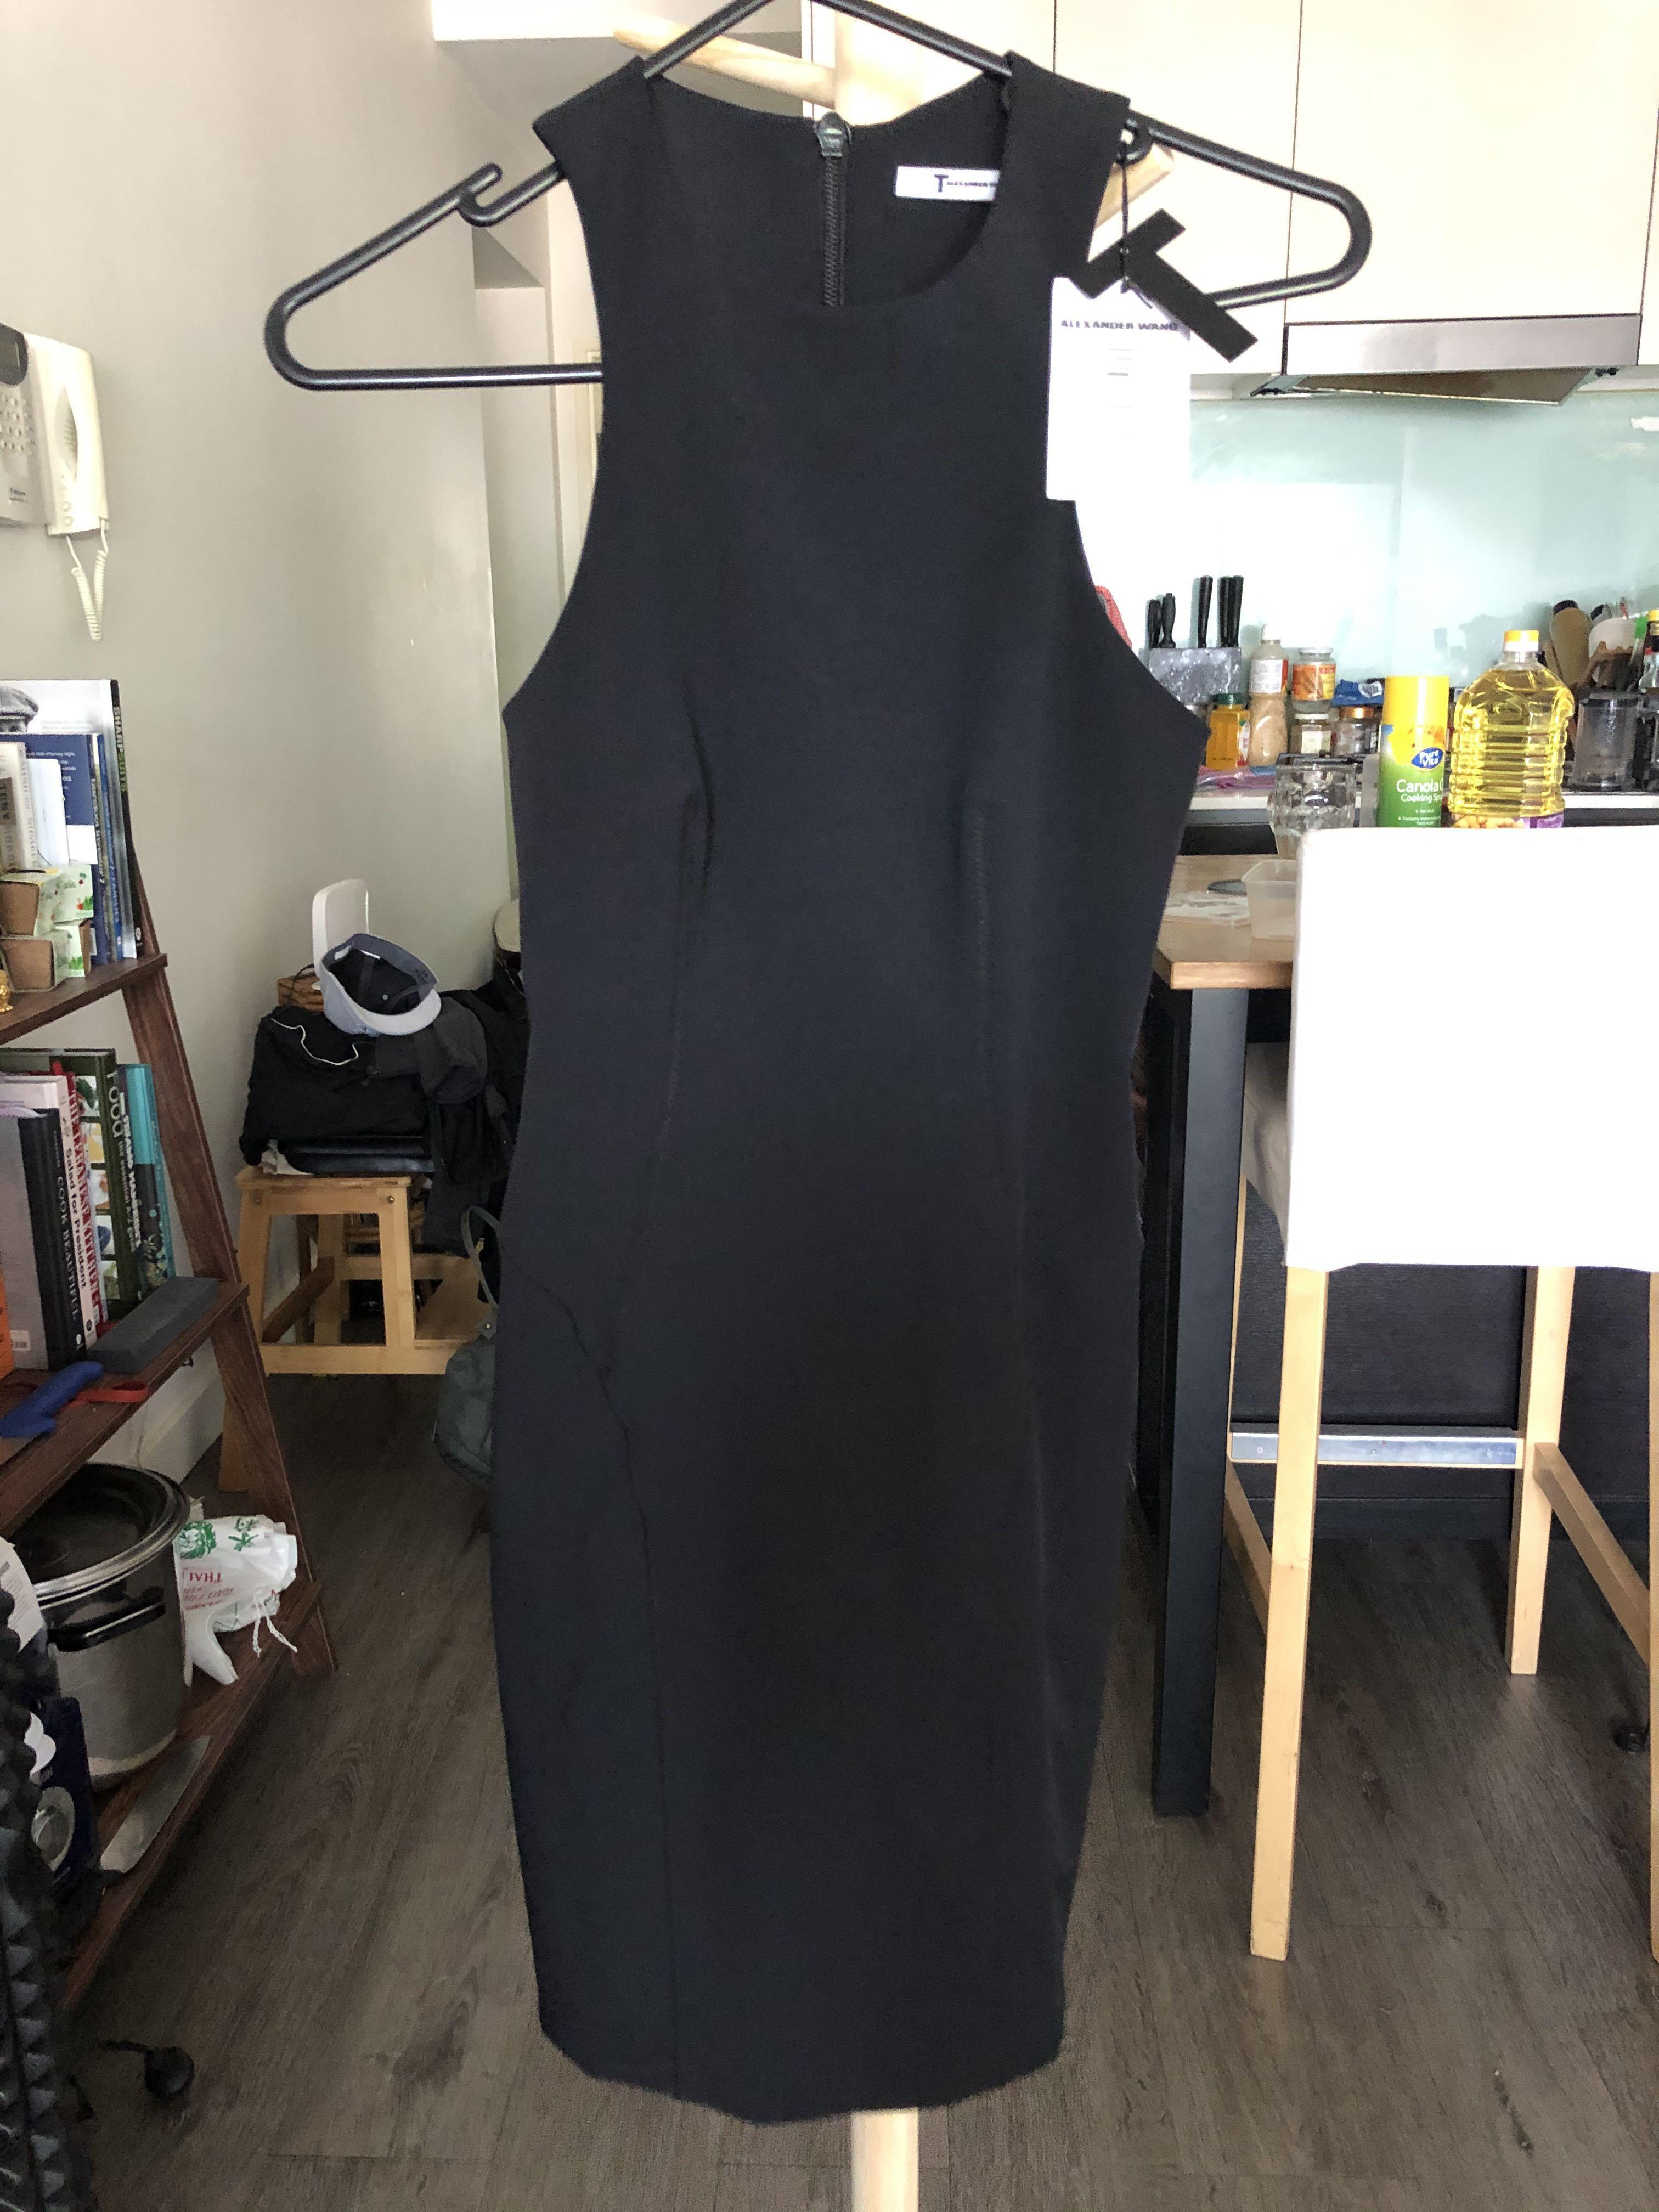 BNWT T BY ALEXANDER WANG BLACK TECH STRETCH DRESS SZ 6